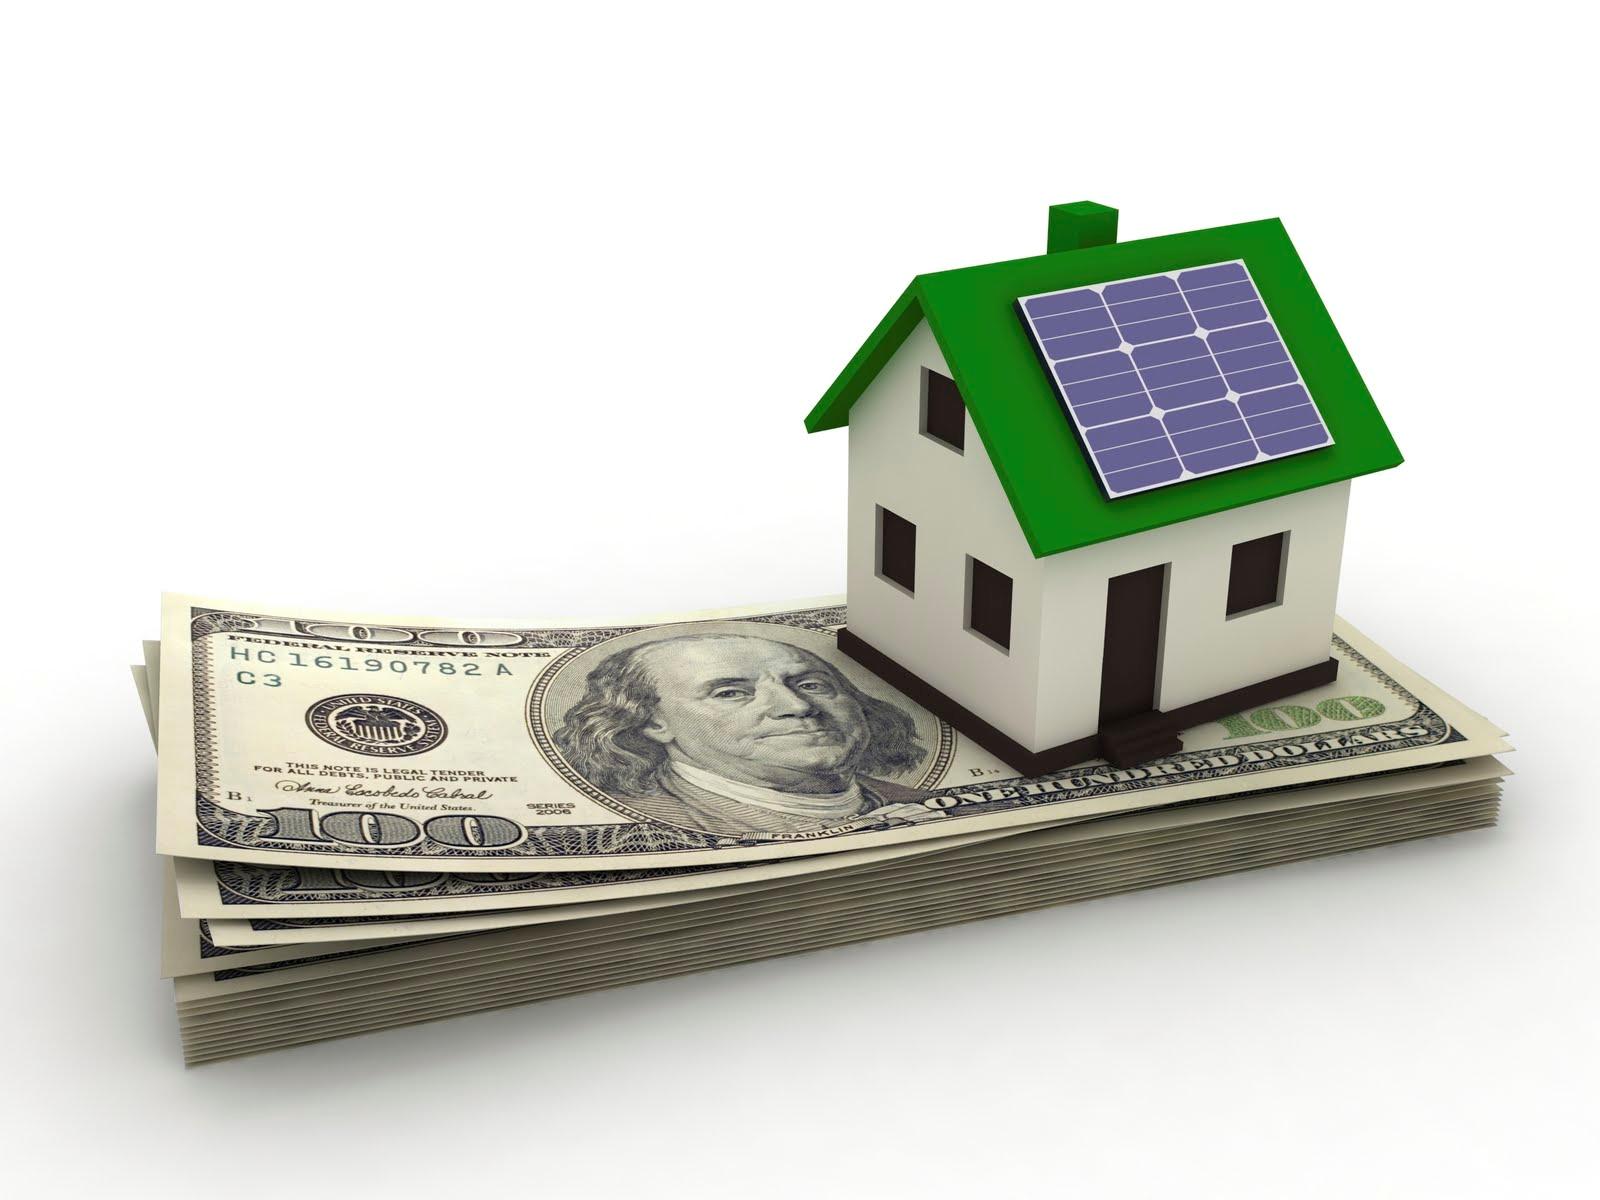 solar pool heating costs